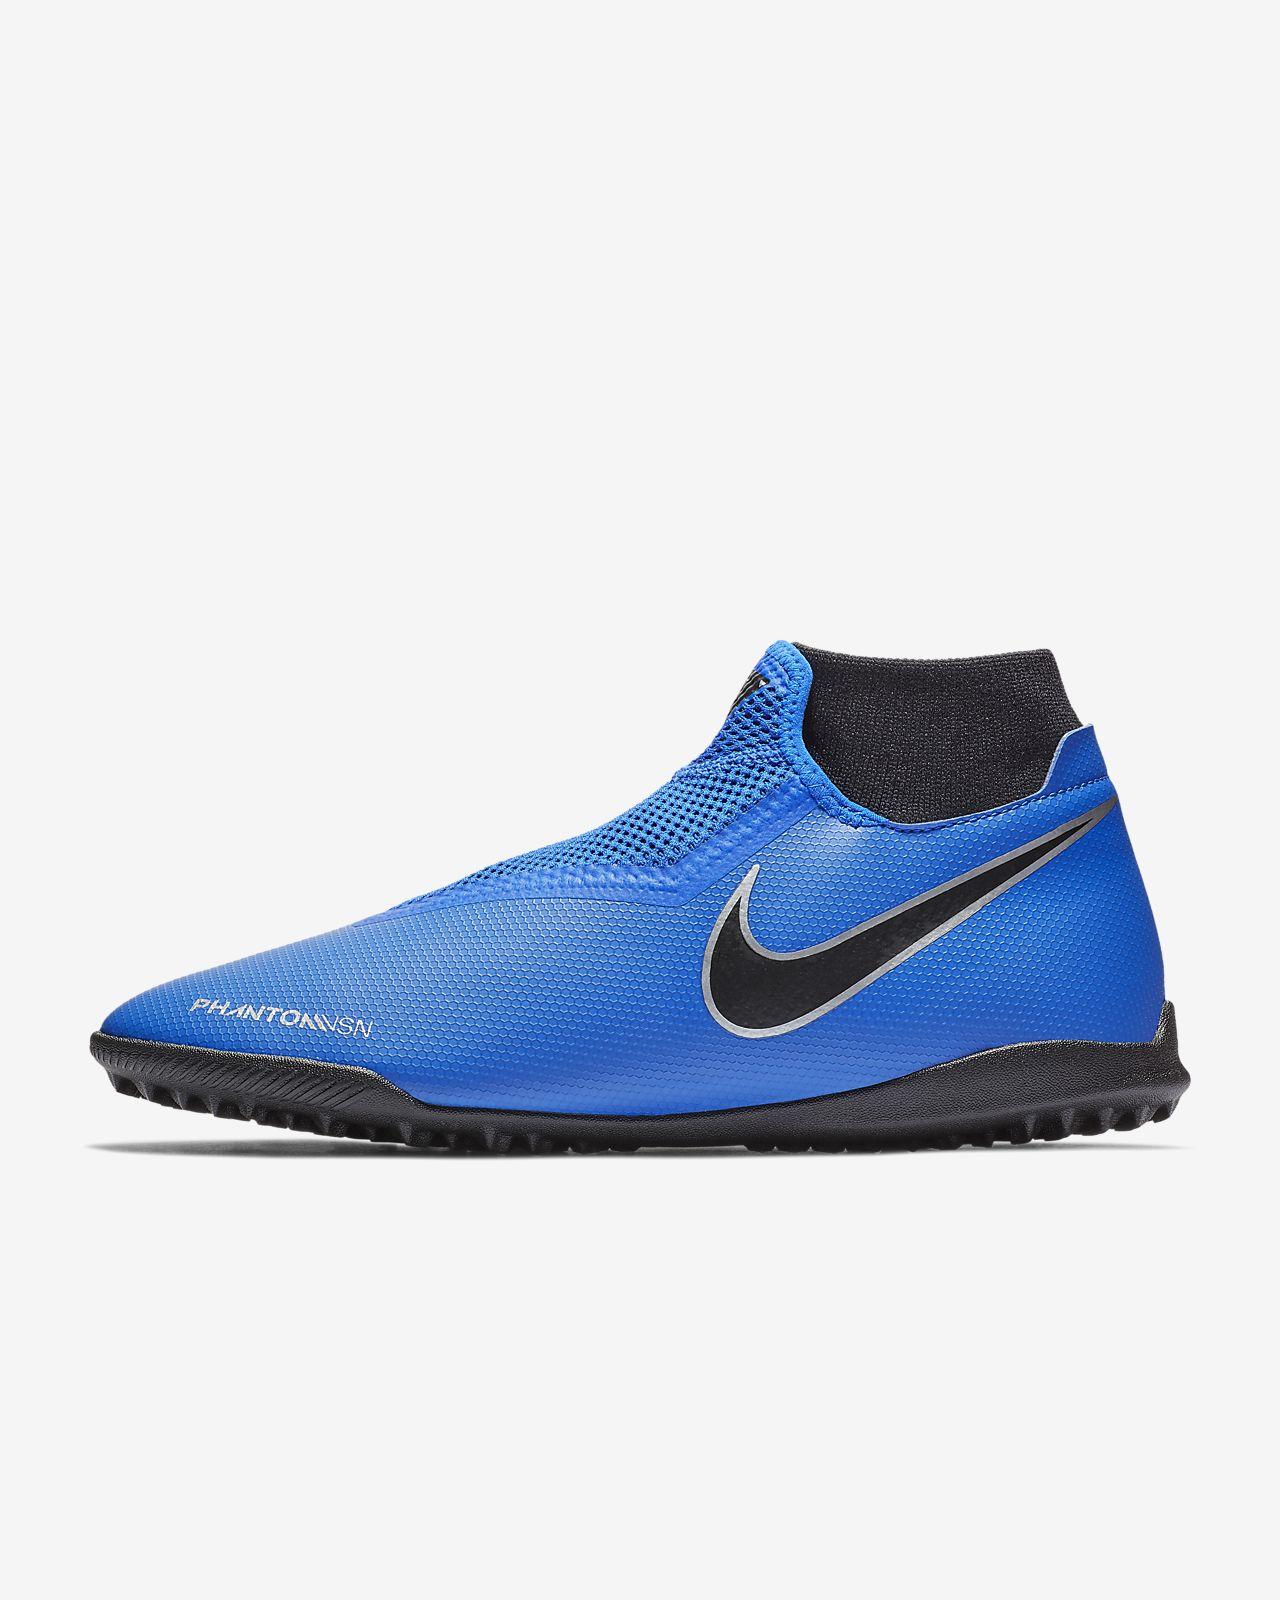 Nike Phantom Vision Academy Dynamic Fit Voetbalschoen (turf)